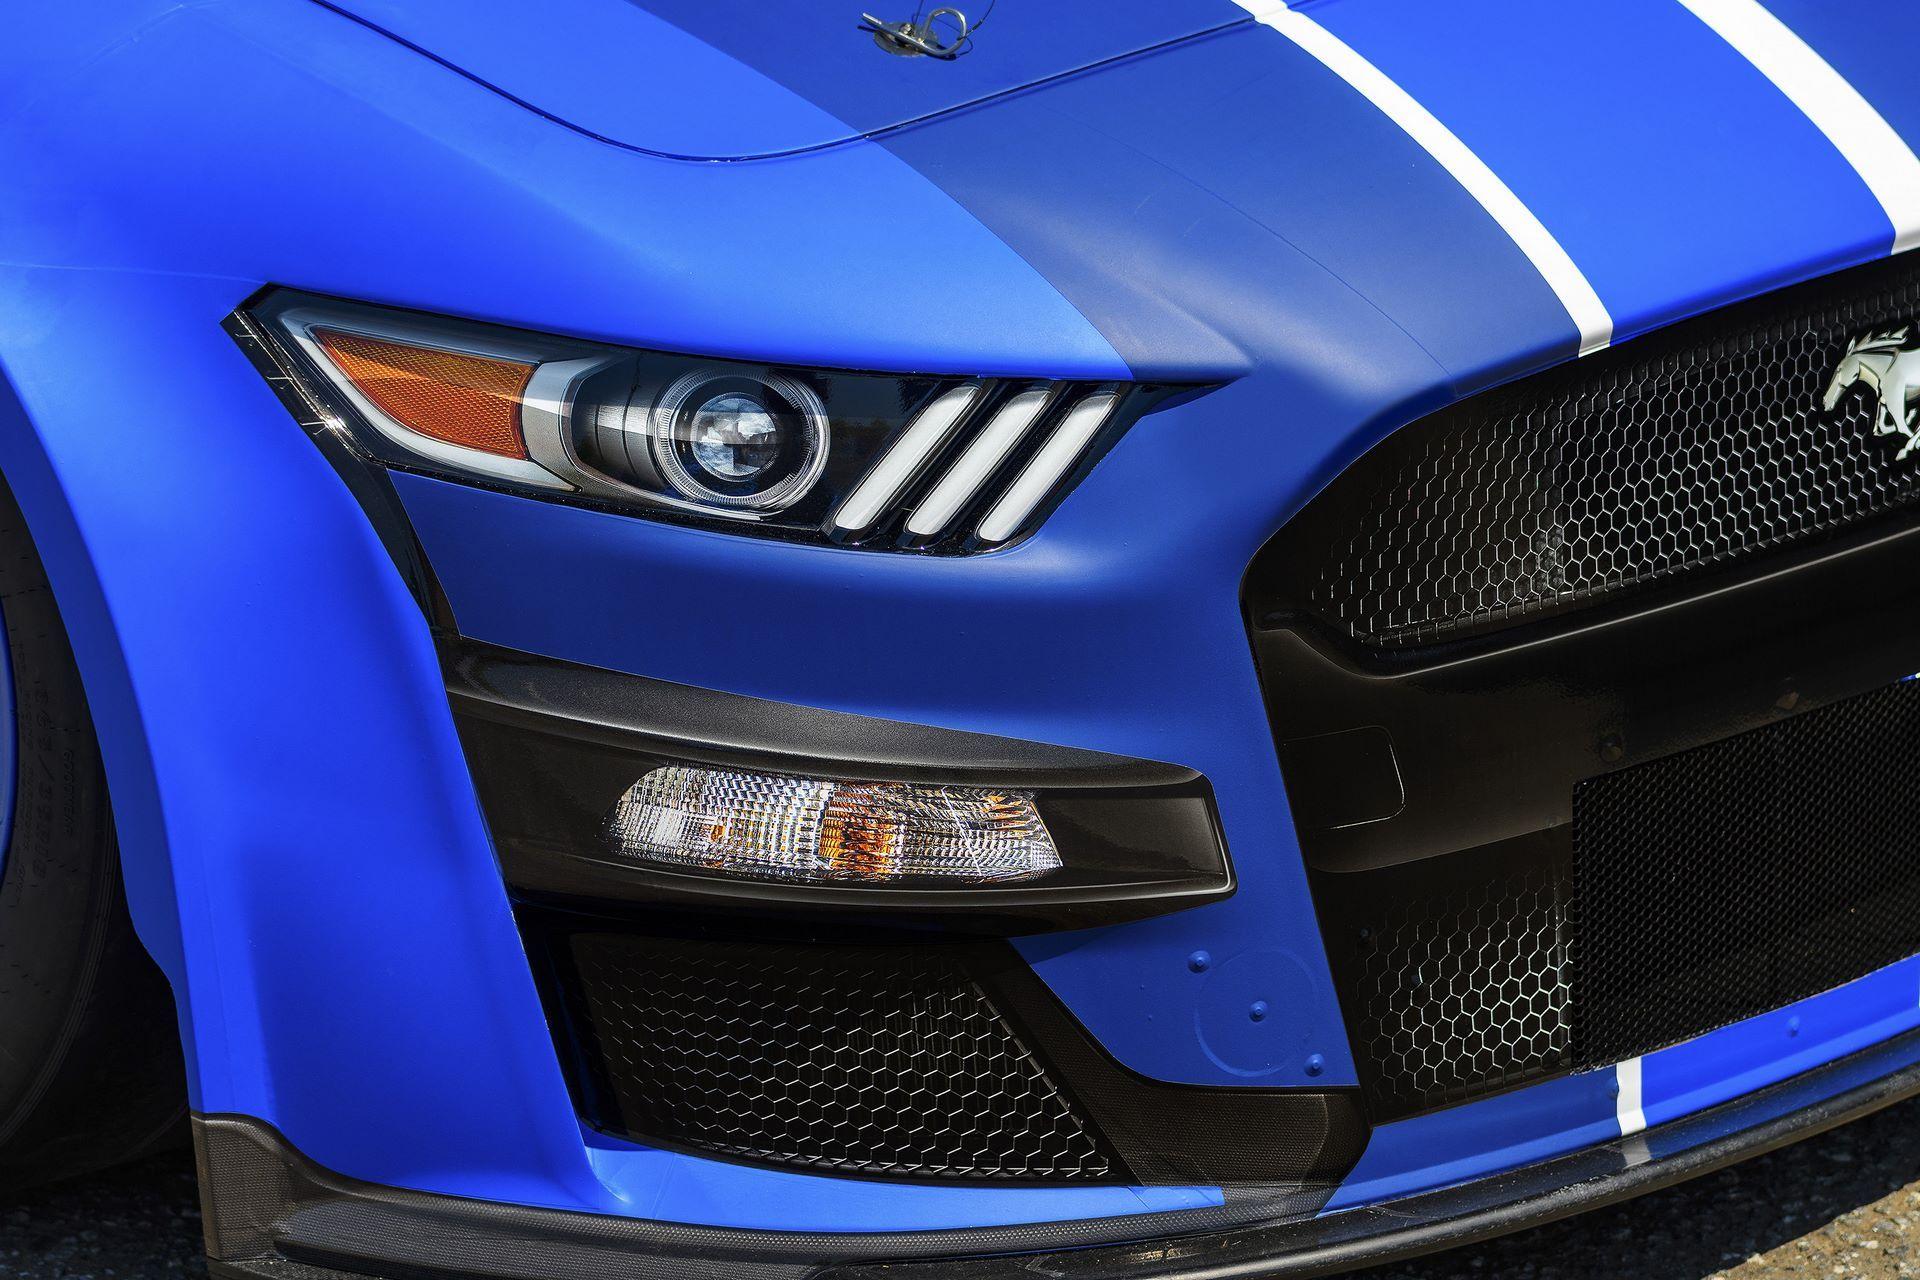 Ford-Mustang-Next-Gen-Nascar-14